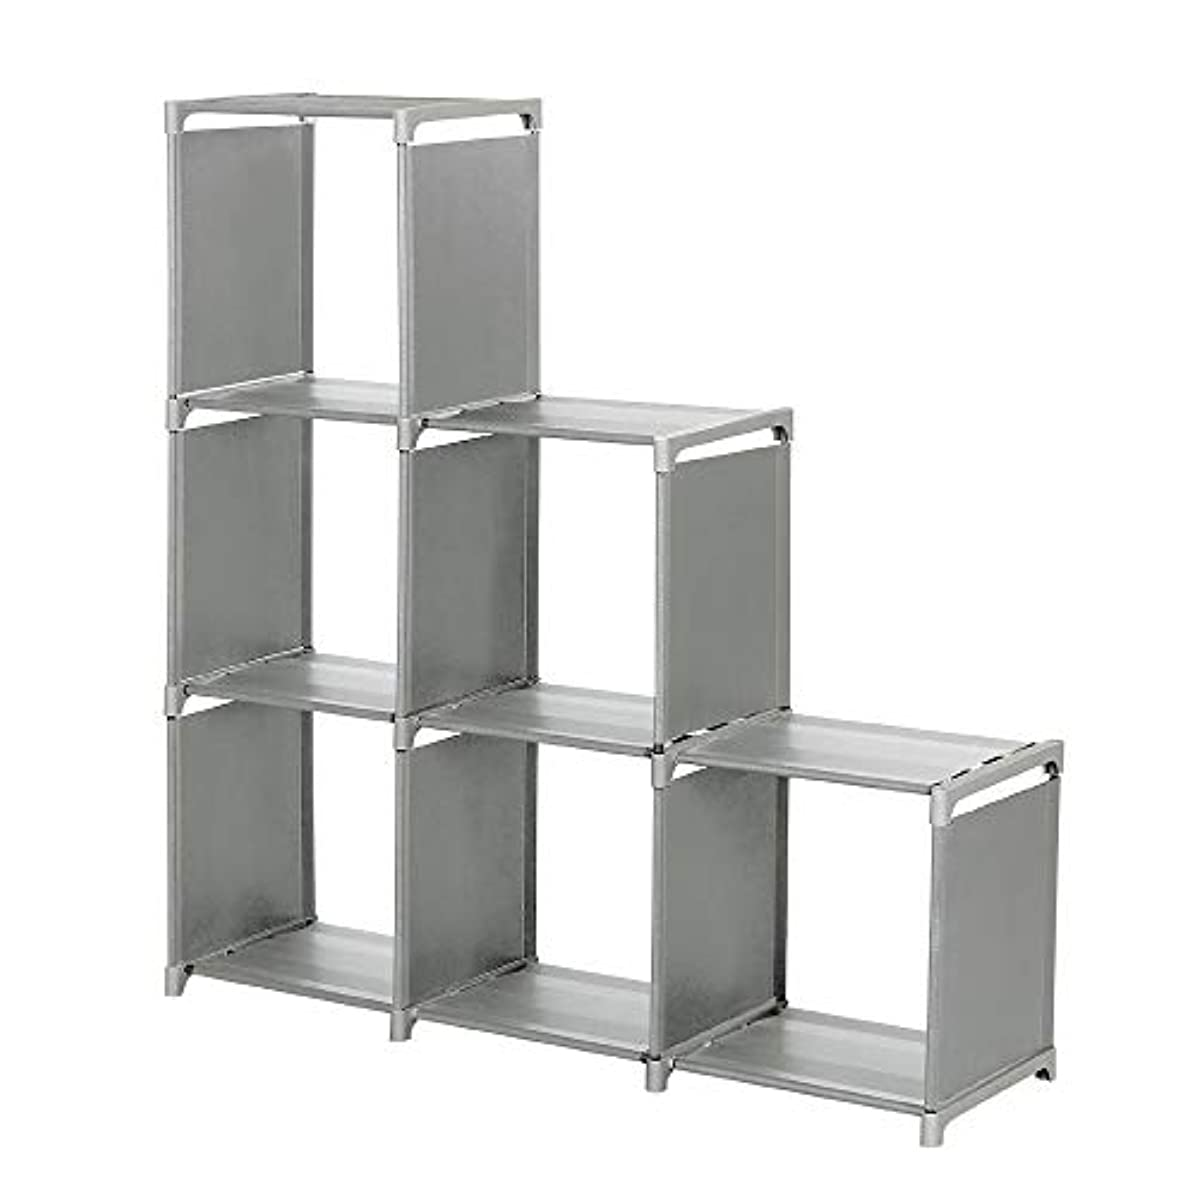 Eolgo Classic 3-Tier Storage Cube Closet Organizer Shelf 6-Cube Cabinet Bookcase (Grey, 40 x 31 x 28 cm)